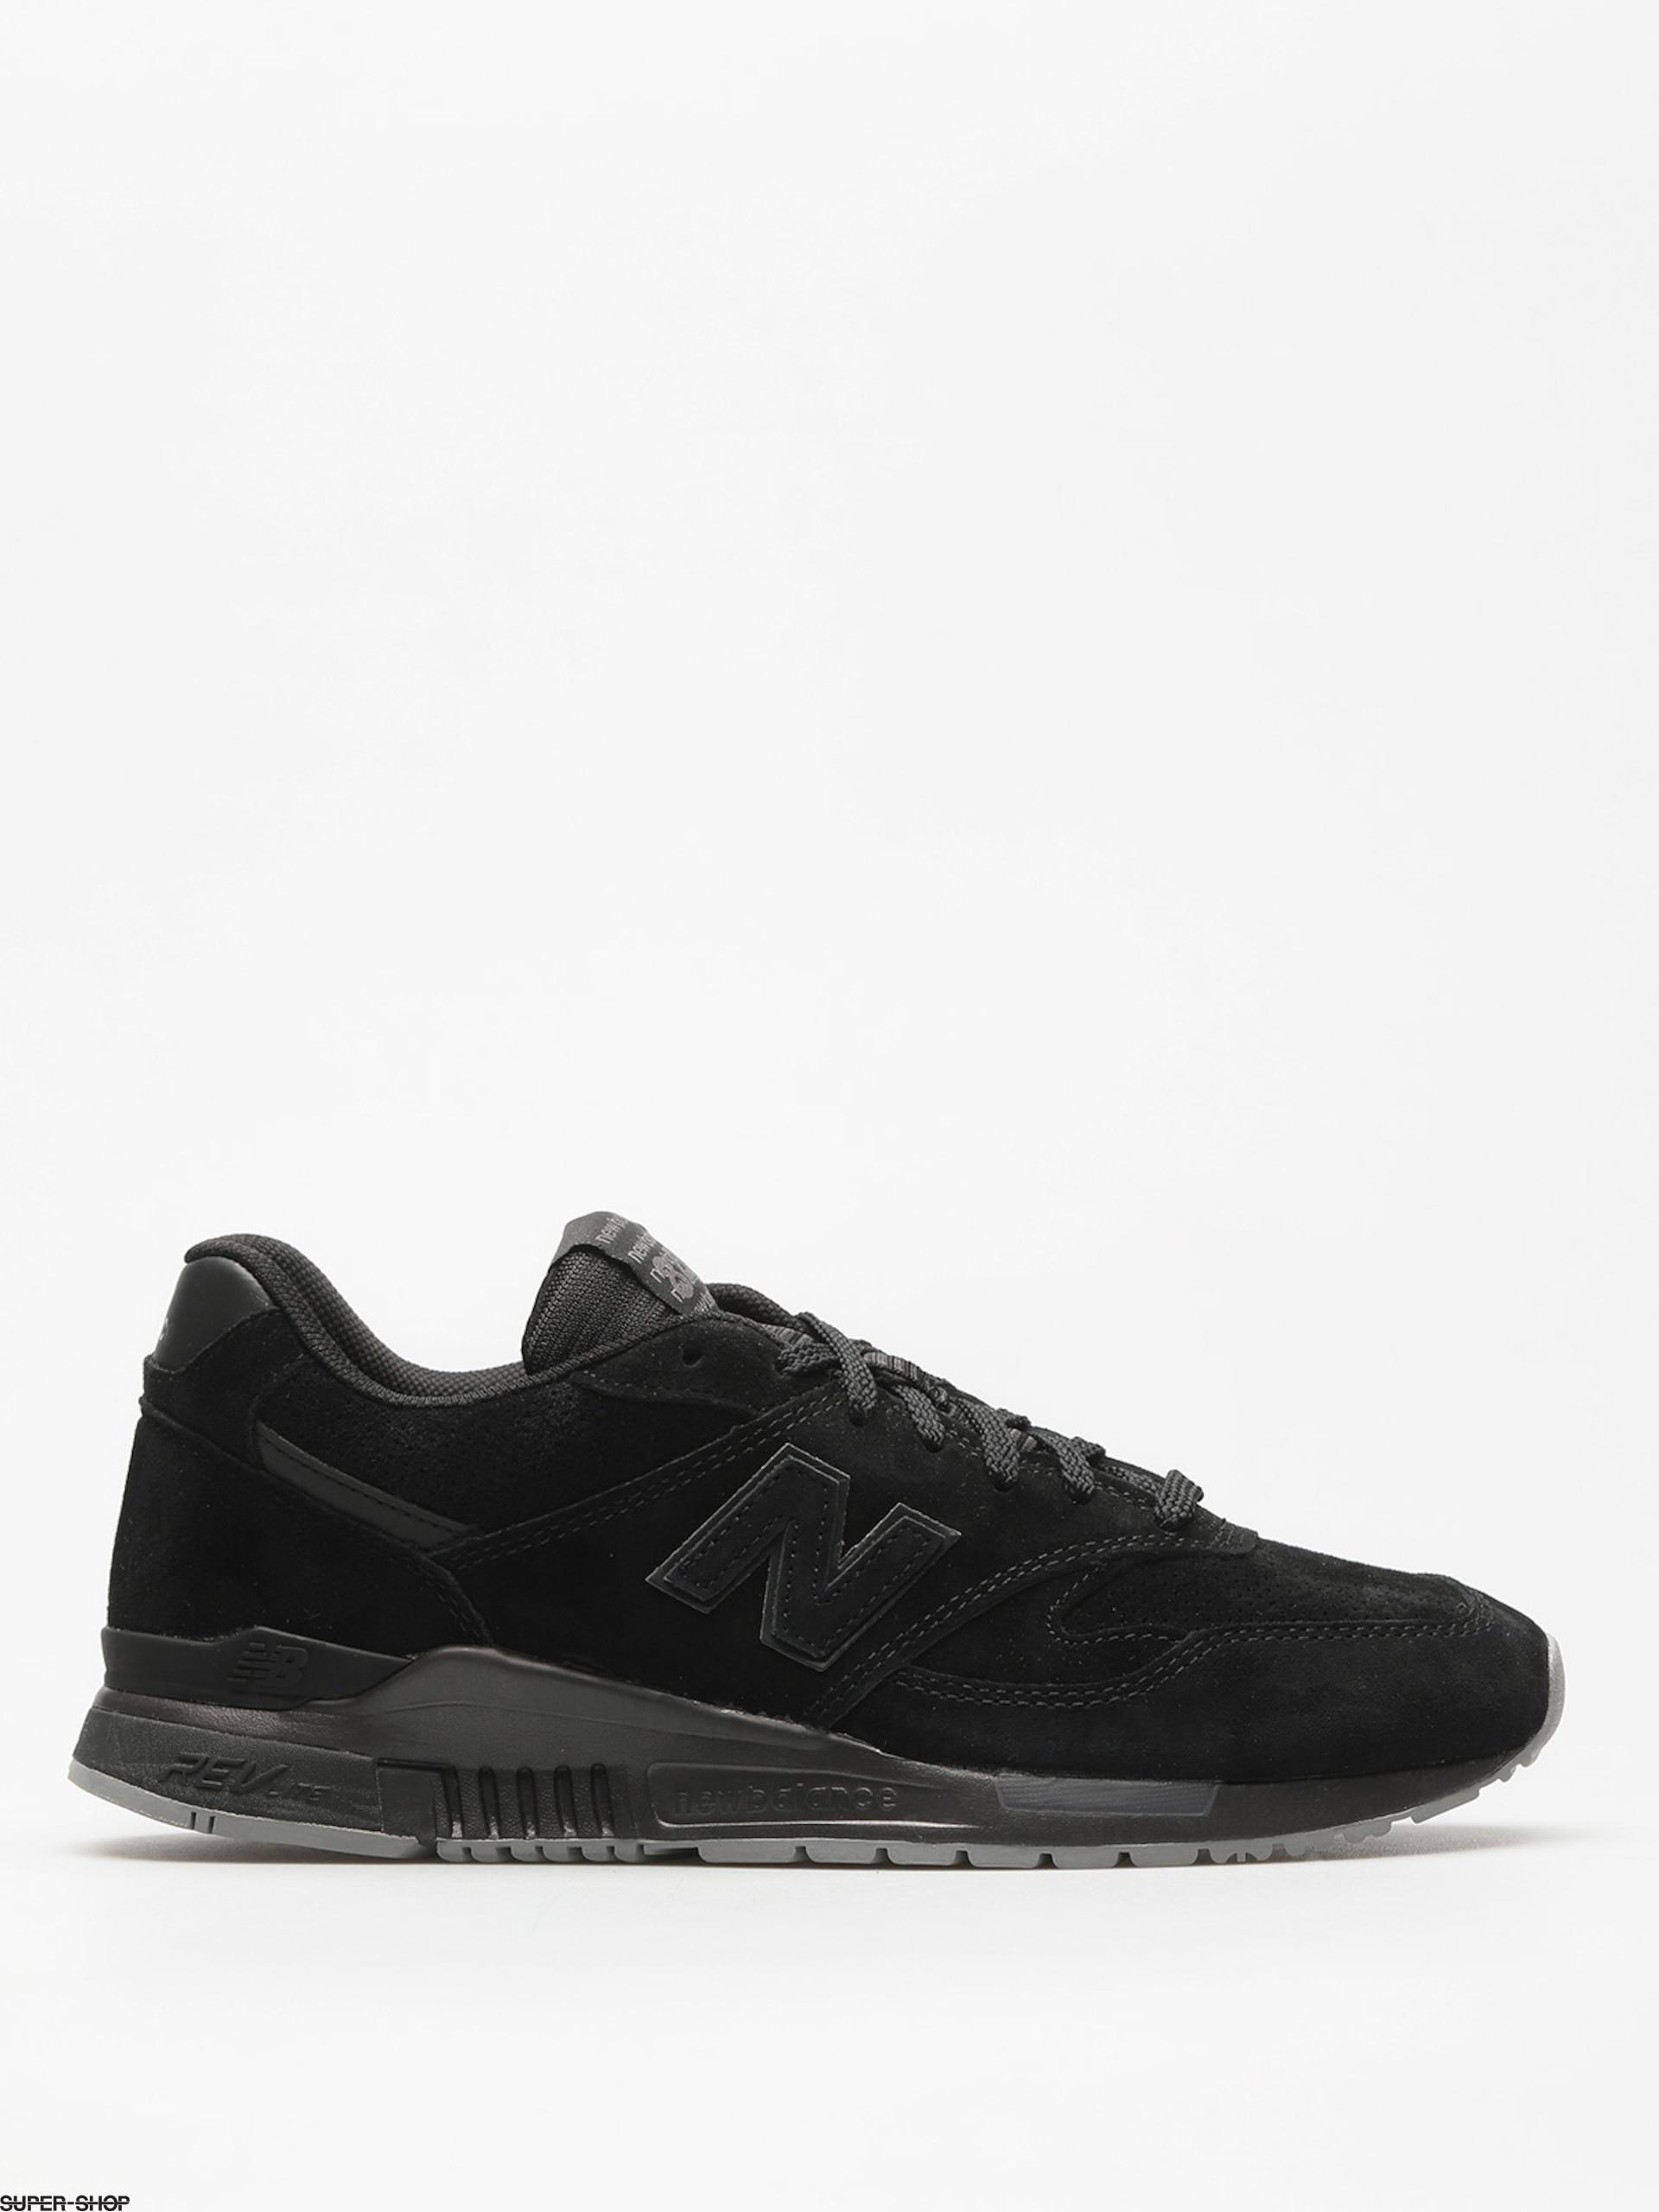 official photos 12bff afd56 New Balance Schuhe 840 (black)